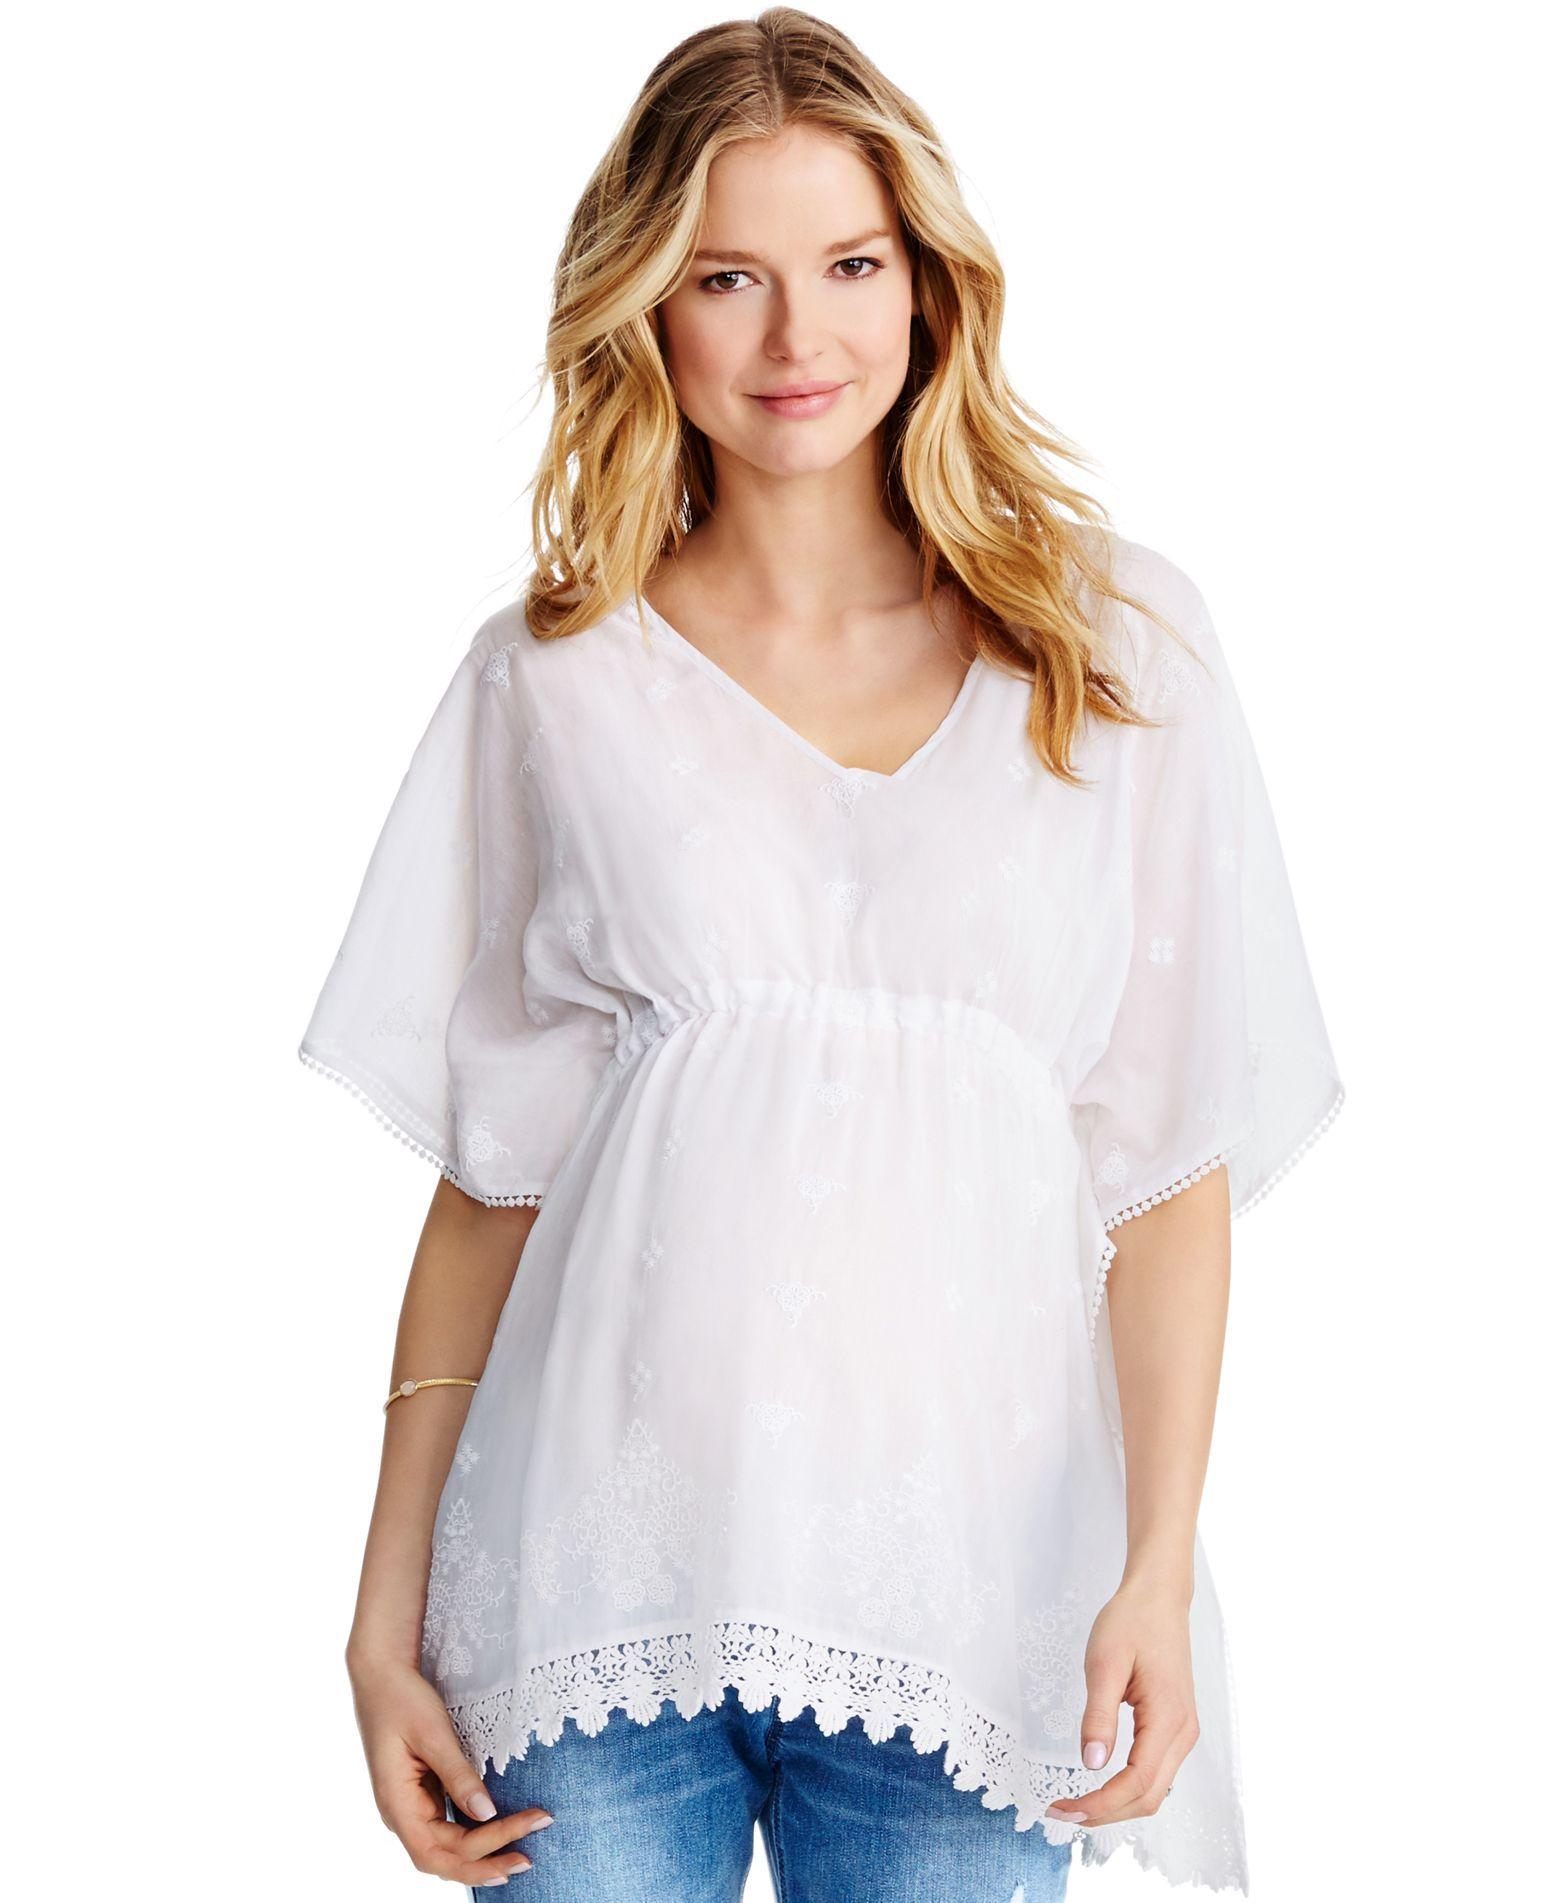 Jessica simpson maternity lace trim peasant blouse products jessica simpson maternity lace trim peasant blouse ombrellifo Image collections